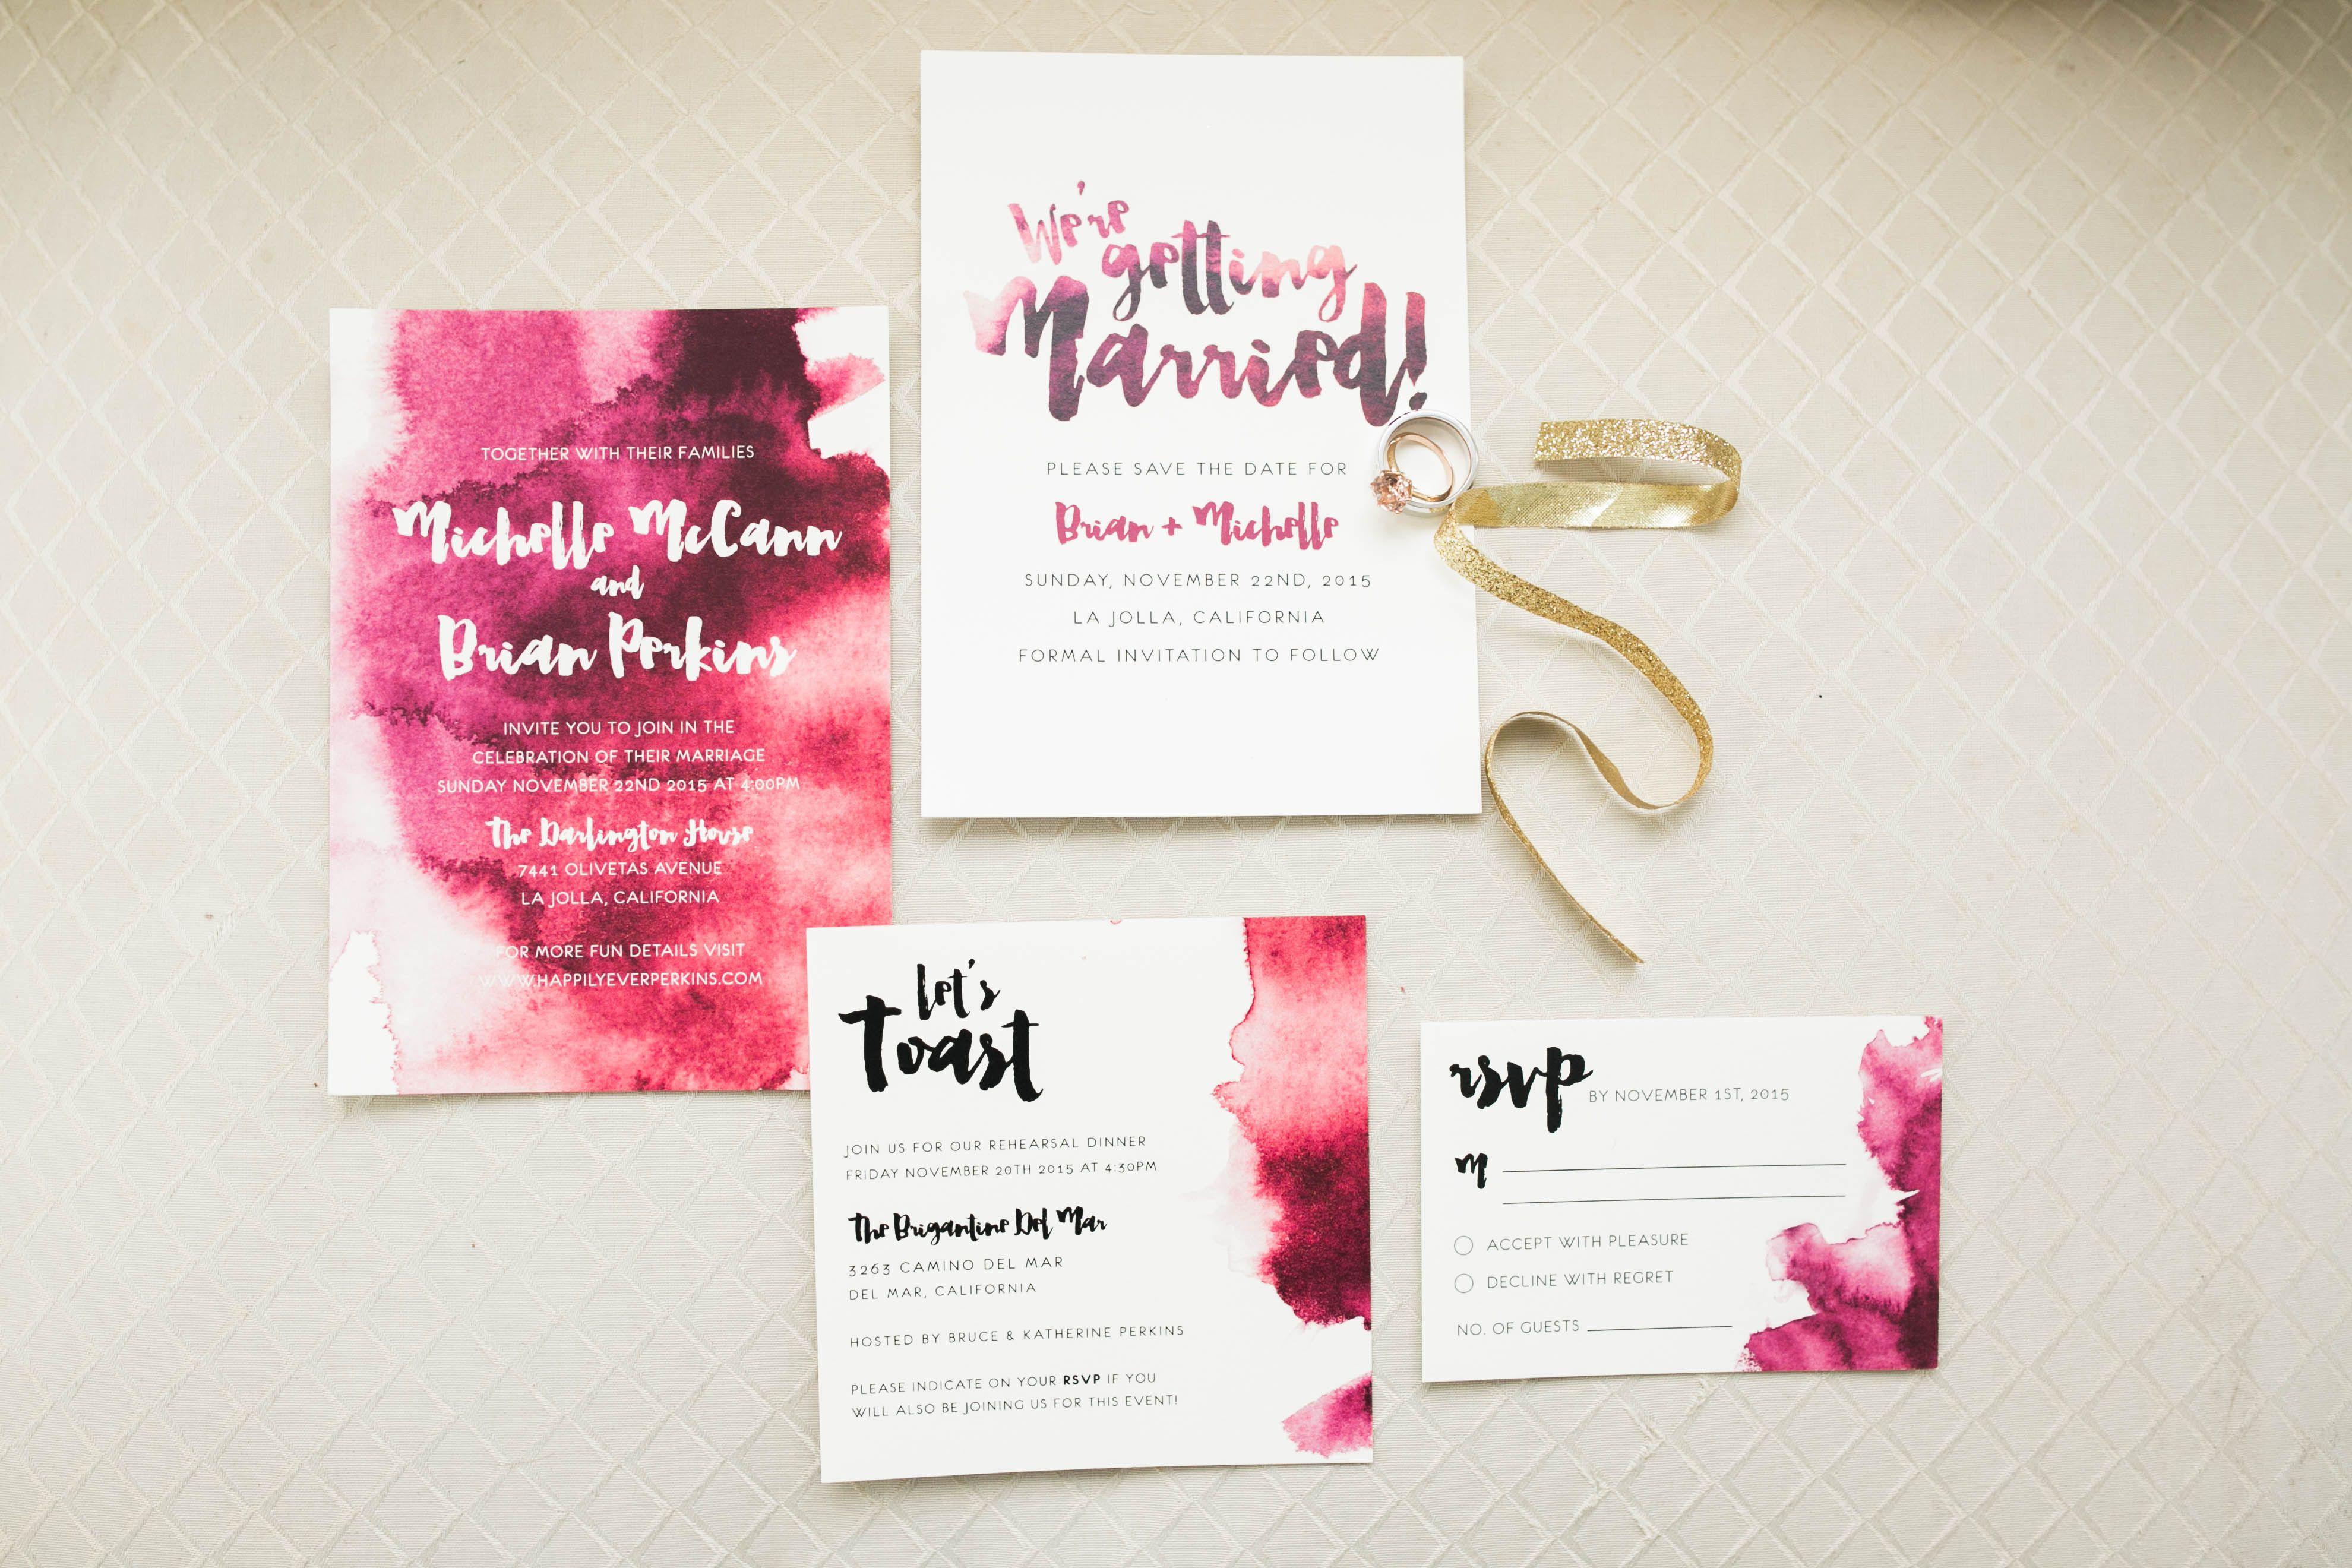 Darlington+House+Wedding | Wedding ideas | Pinterest | Wedding ...